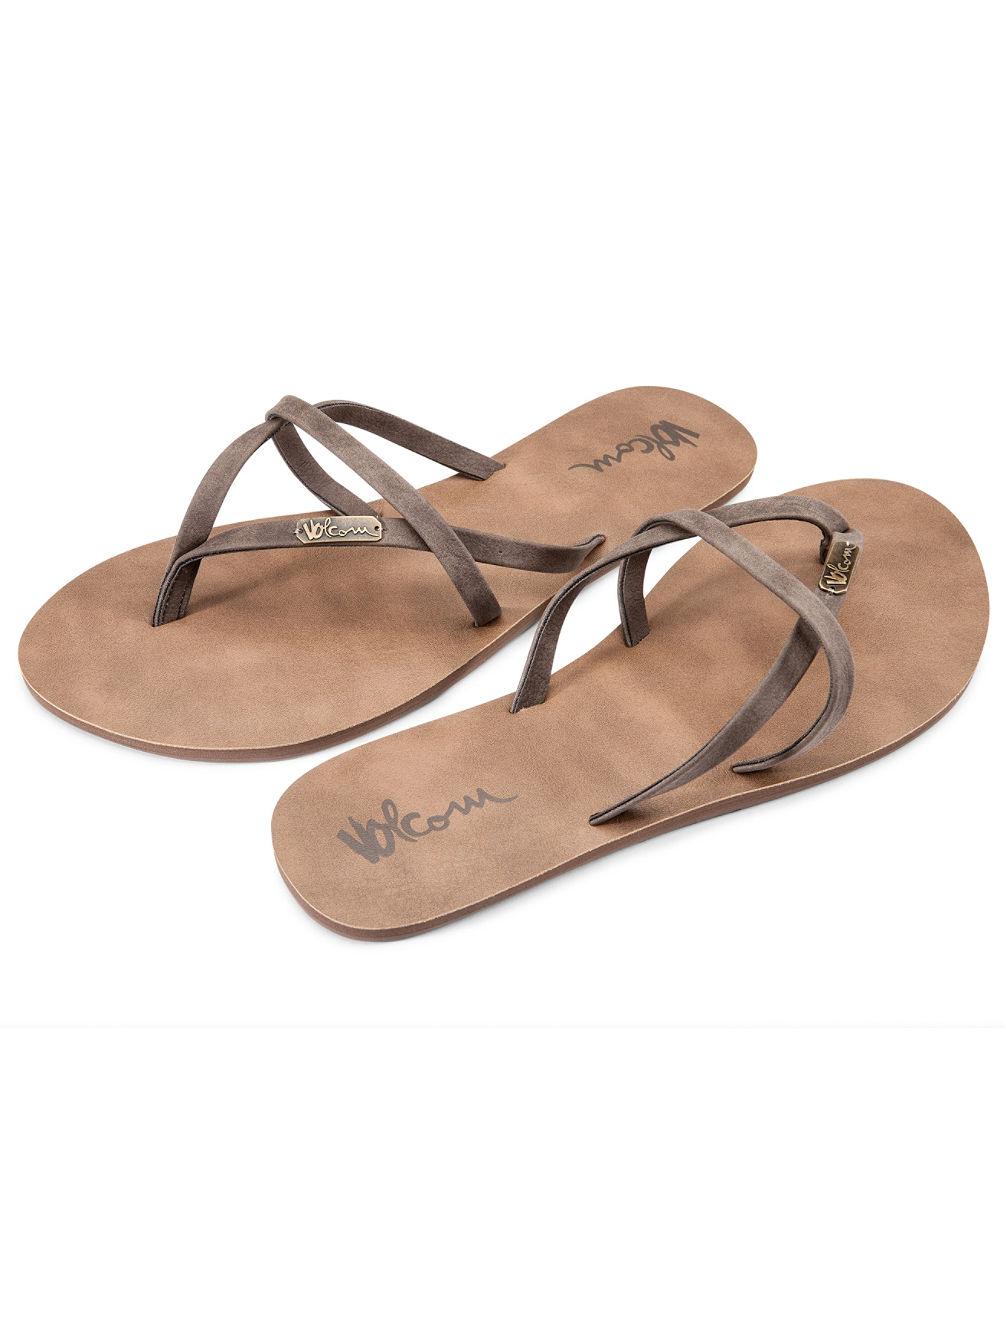 ca025388278 Buy Volcom All Night Long Sandals Women online at blue-tomato.com